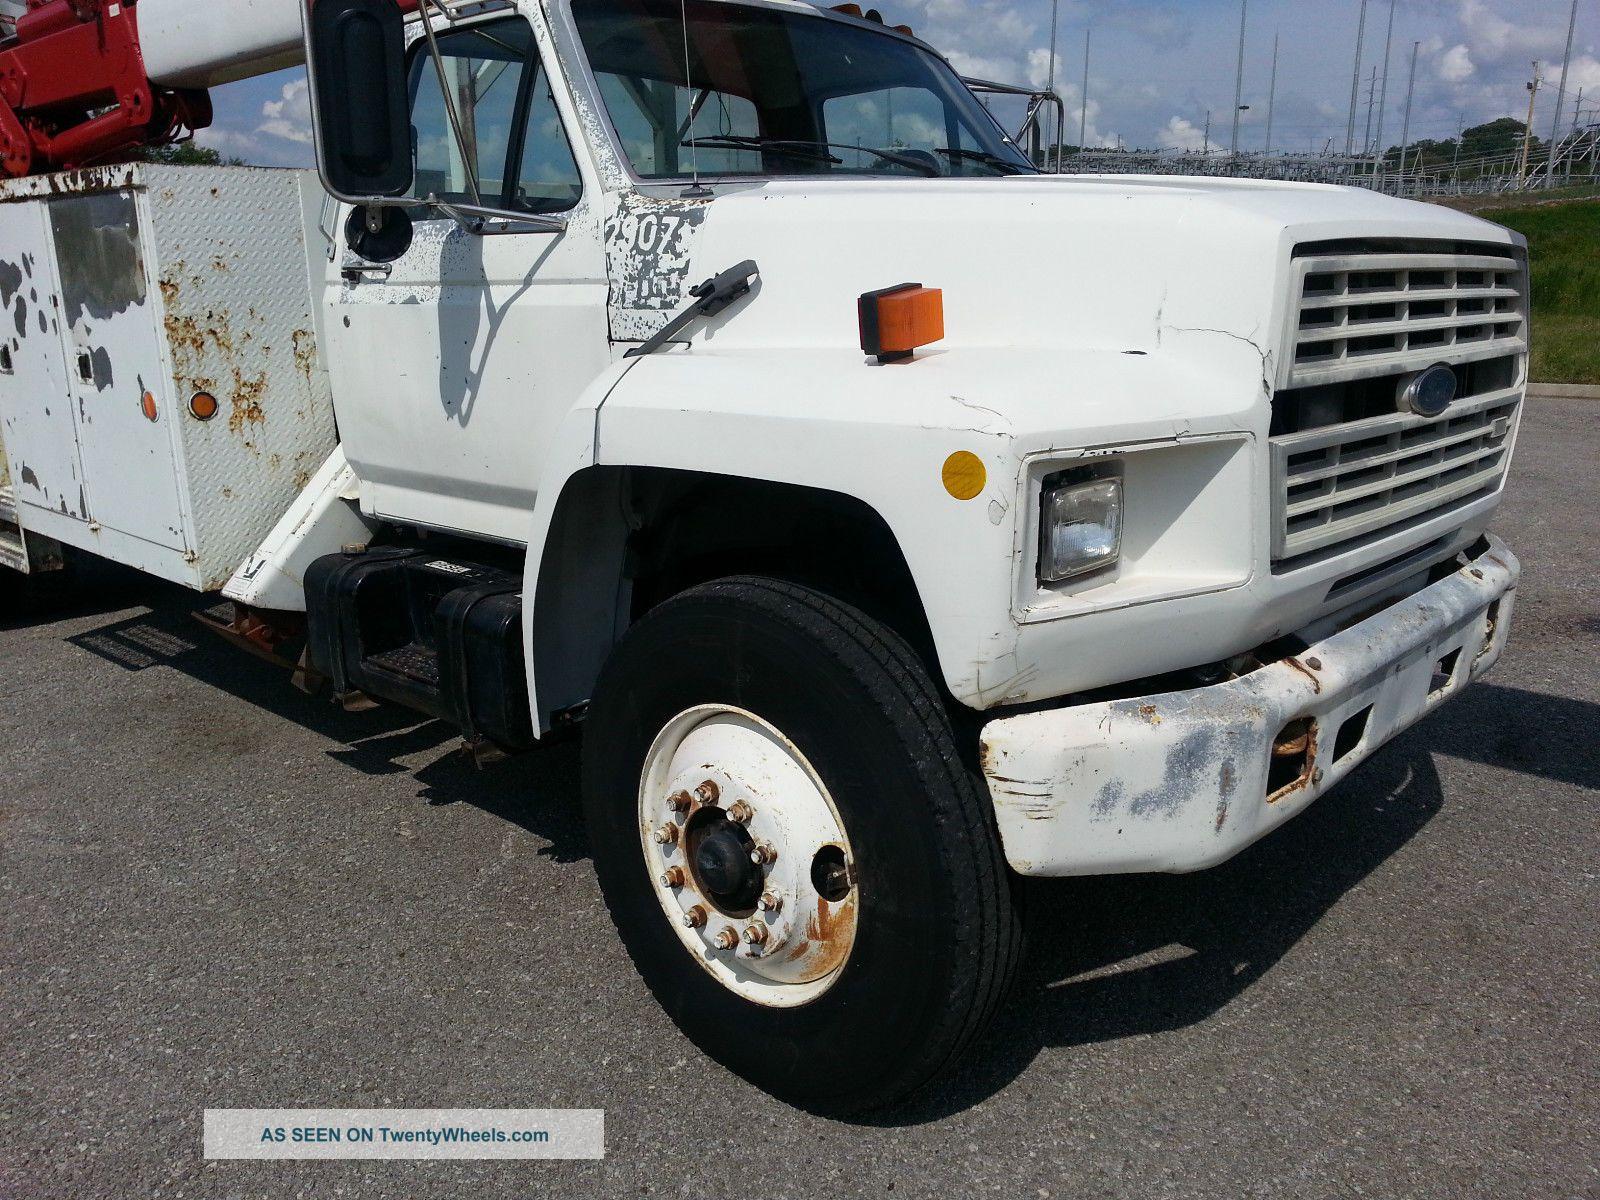 1991 ford f 800 2006 Mack CV713 Granite 2006 Mack CV713 Granite